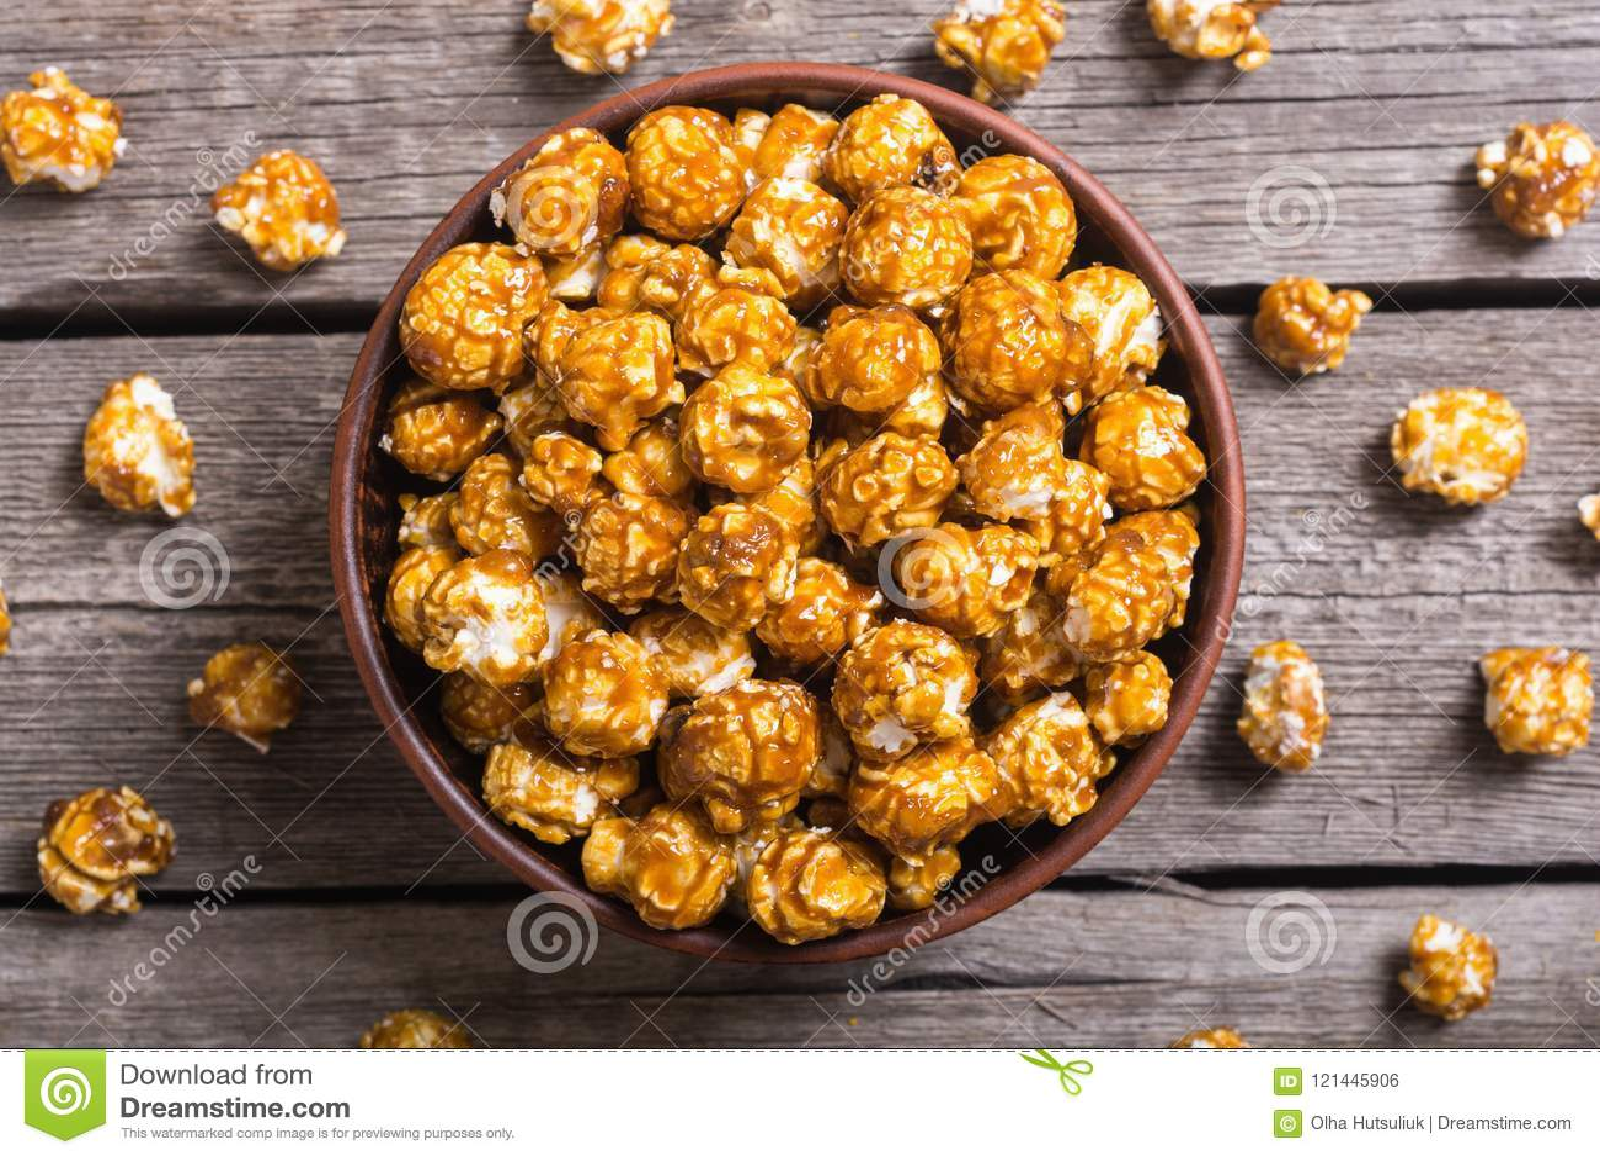 Zoete karamelpopcorn